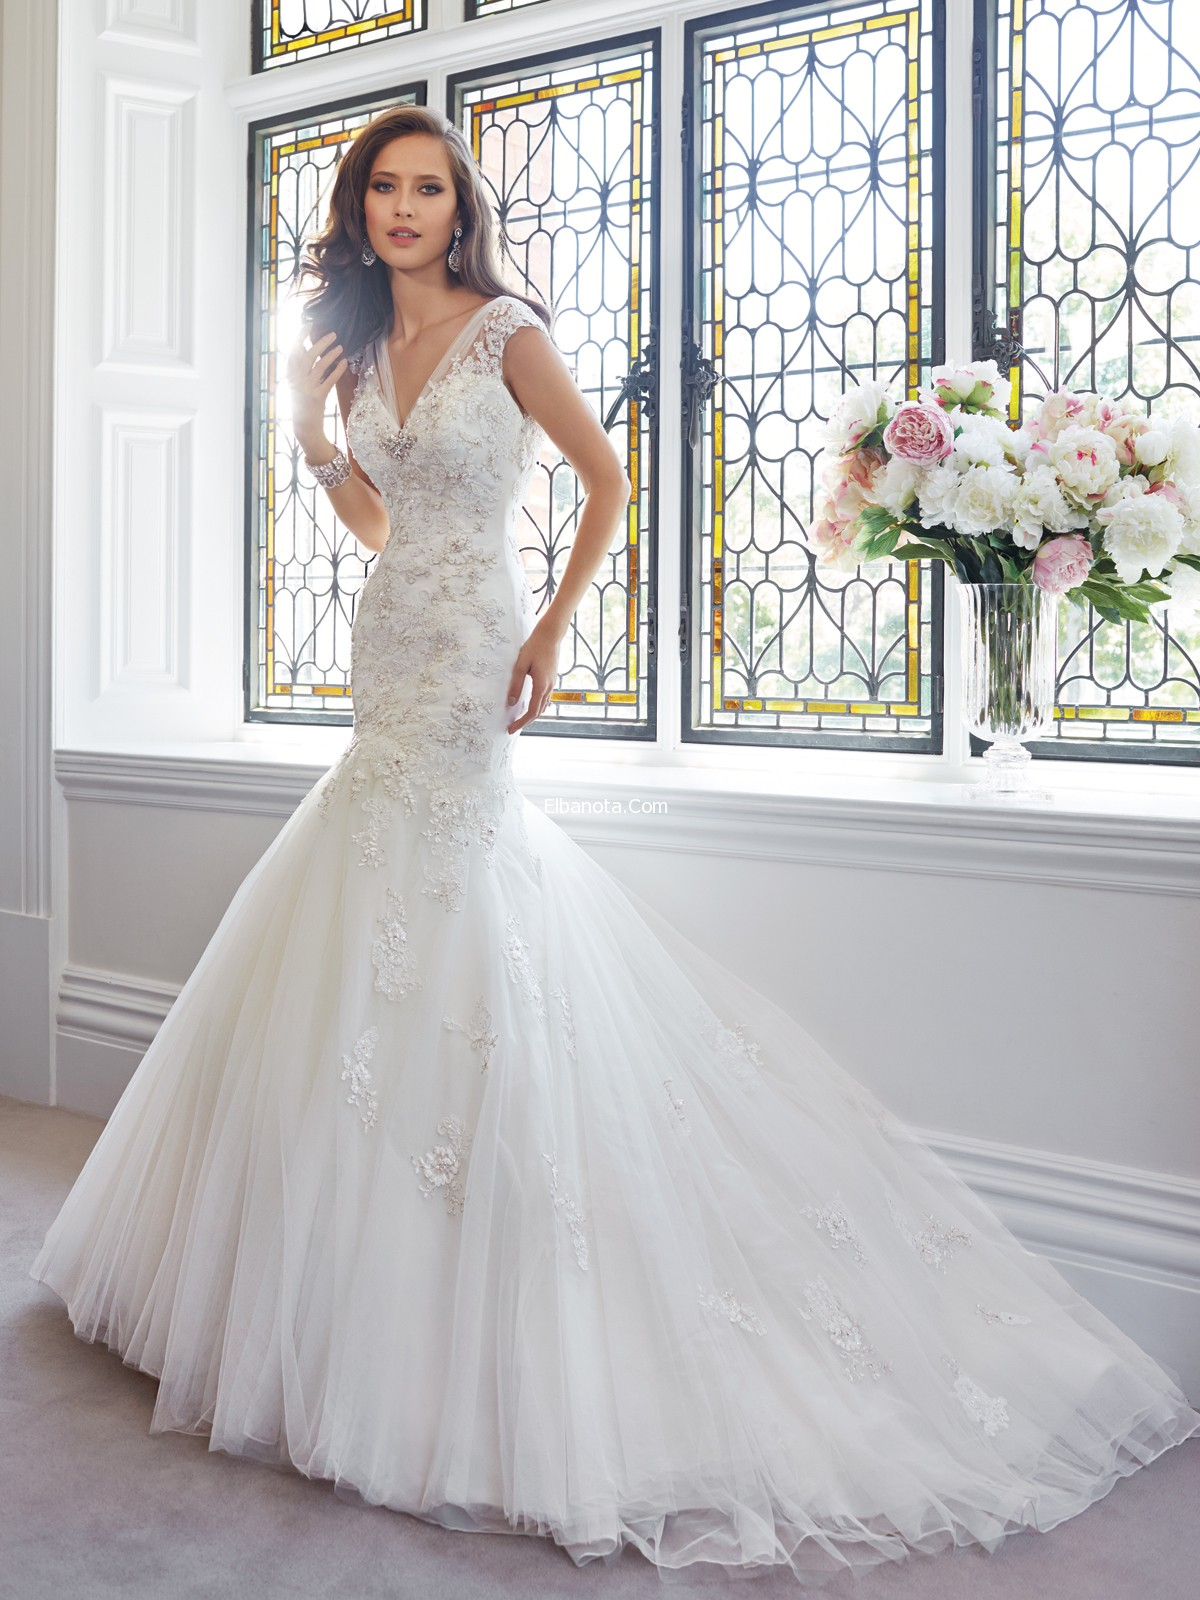 بالصور احدث صور فساتين العروس 2019 6fb99eb88f0888ede0fec600658533cb